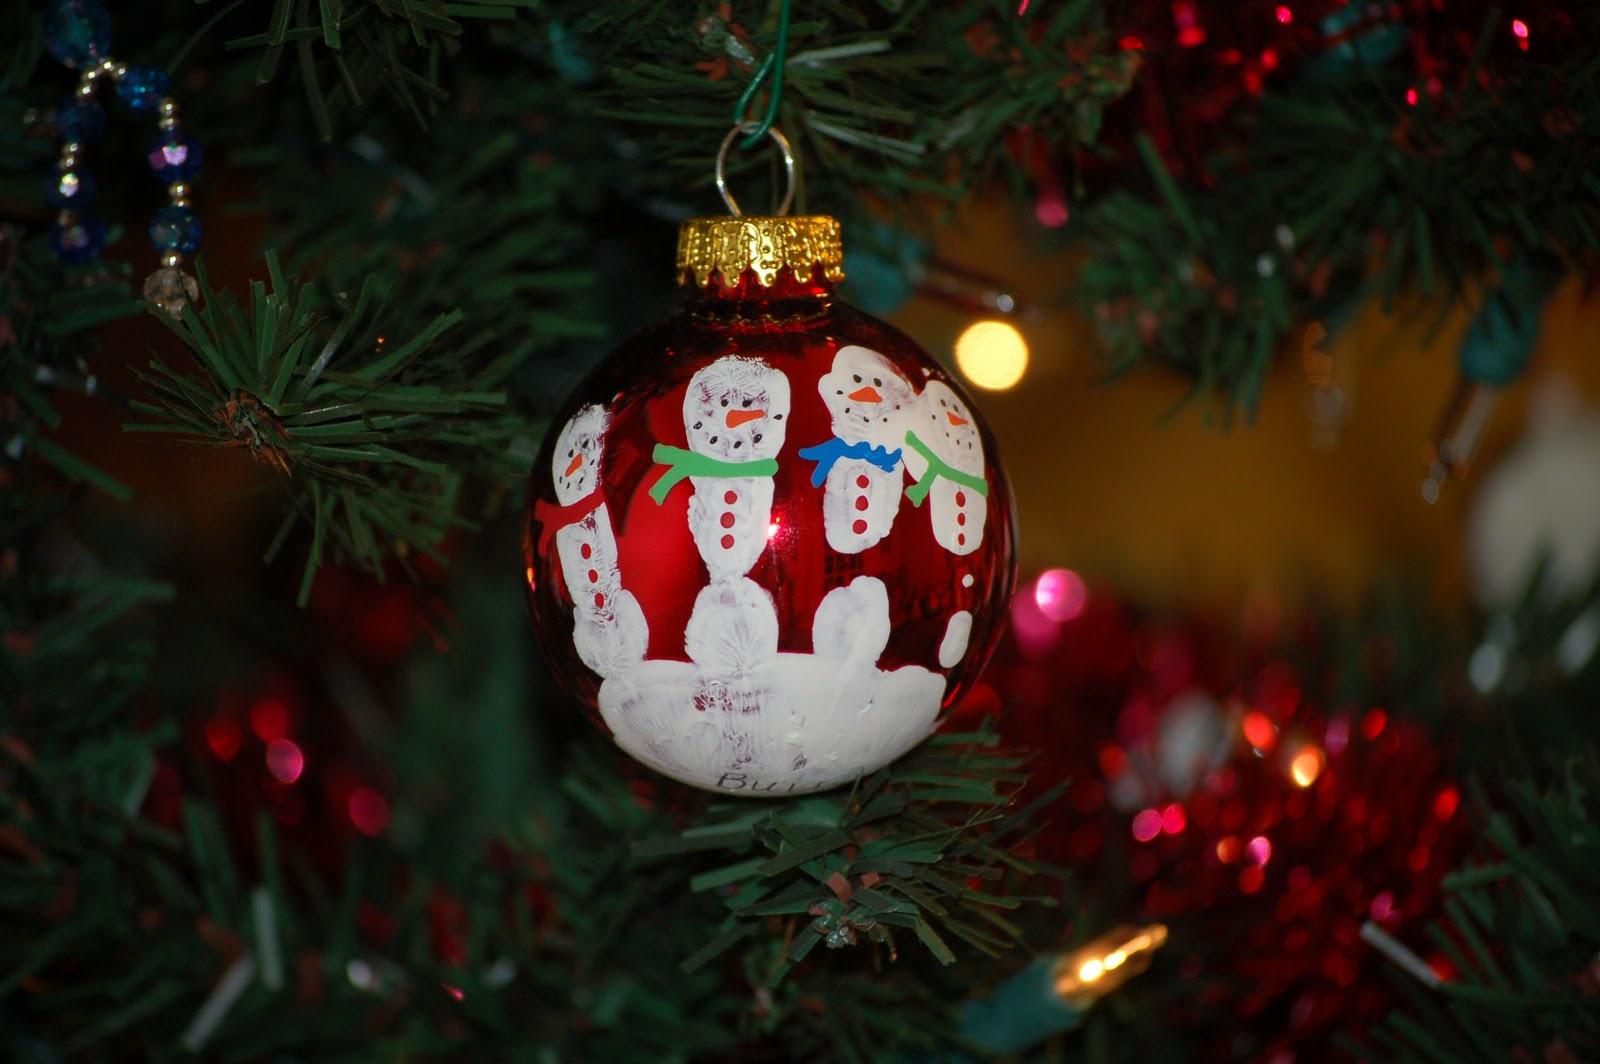 24/7 MOMS: Handprints And Fingerprints For Gift Giving